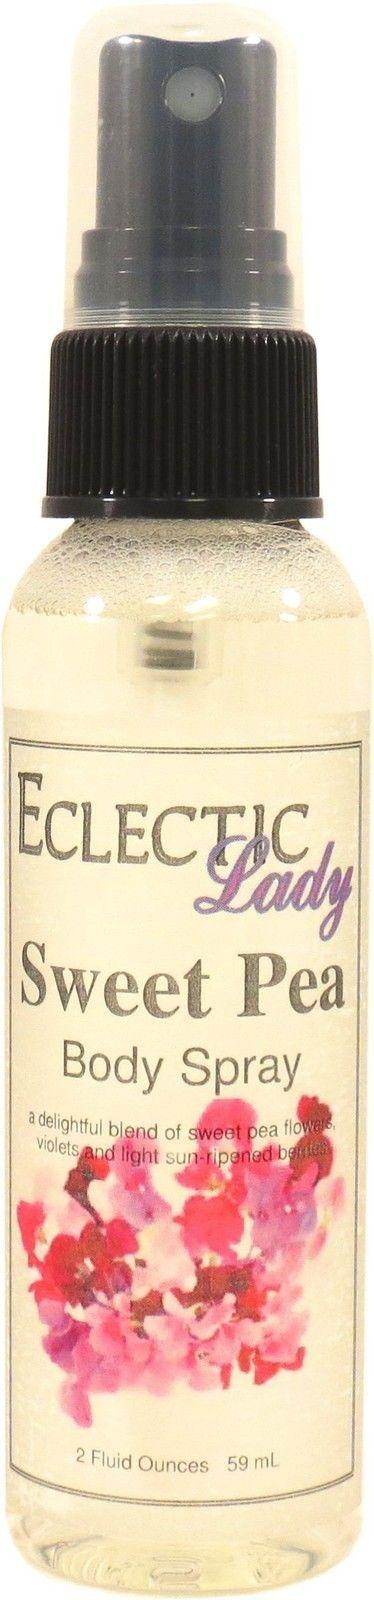 Sweet Pea Body Spray